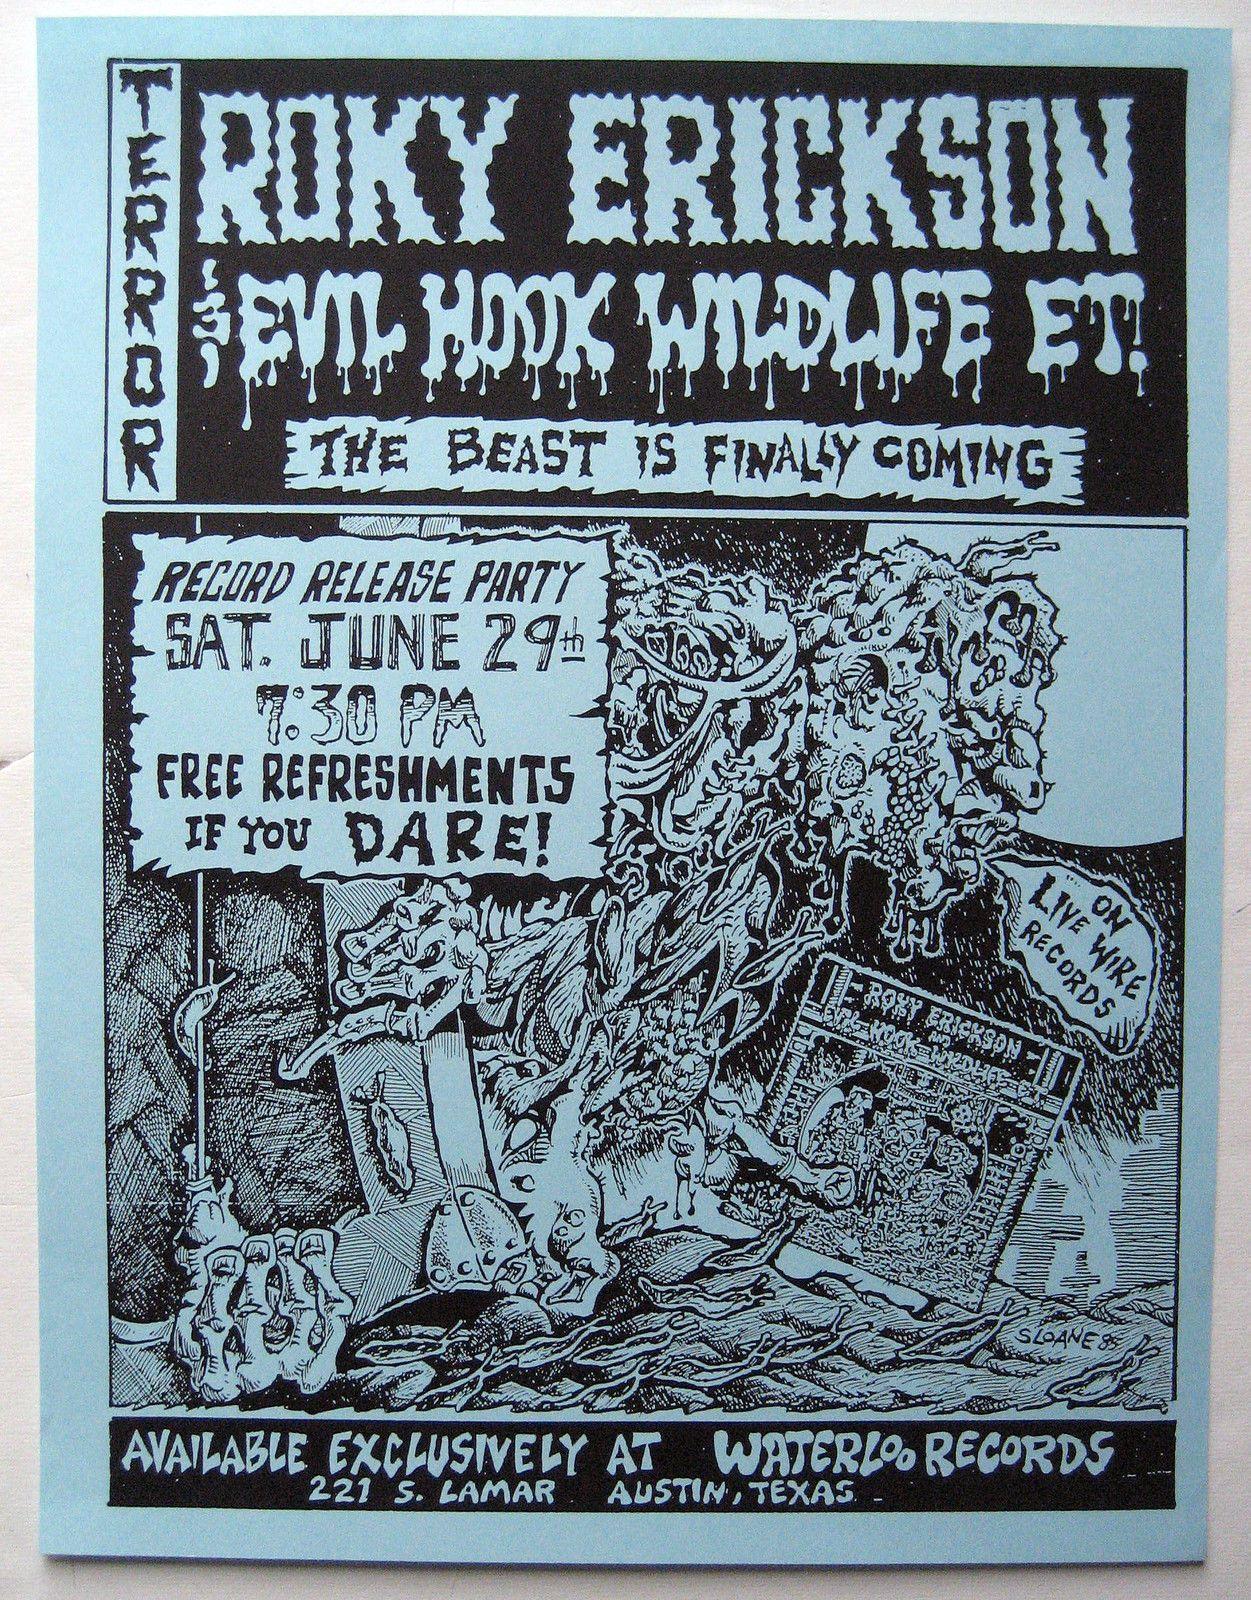 Roky Erickson 13th Floor Elevators Evil Hook Wildlife Record Release Poster | eBay